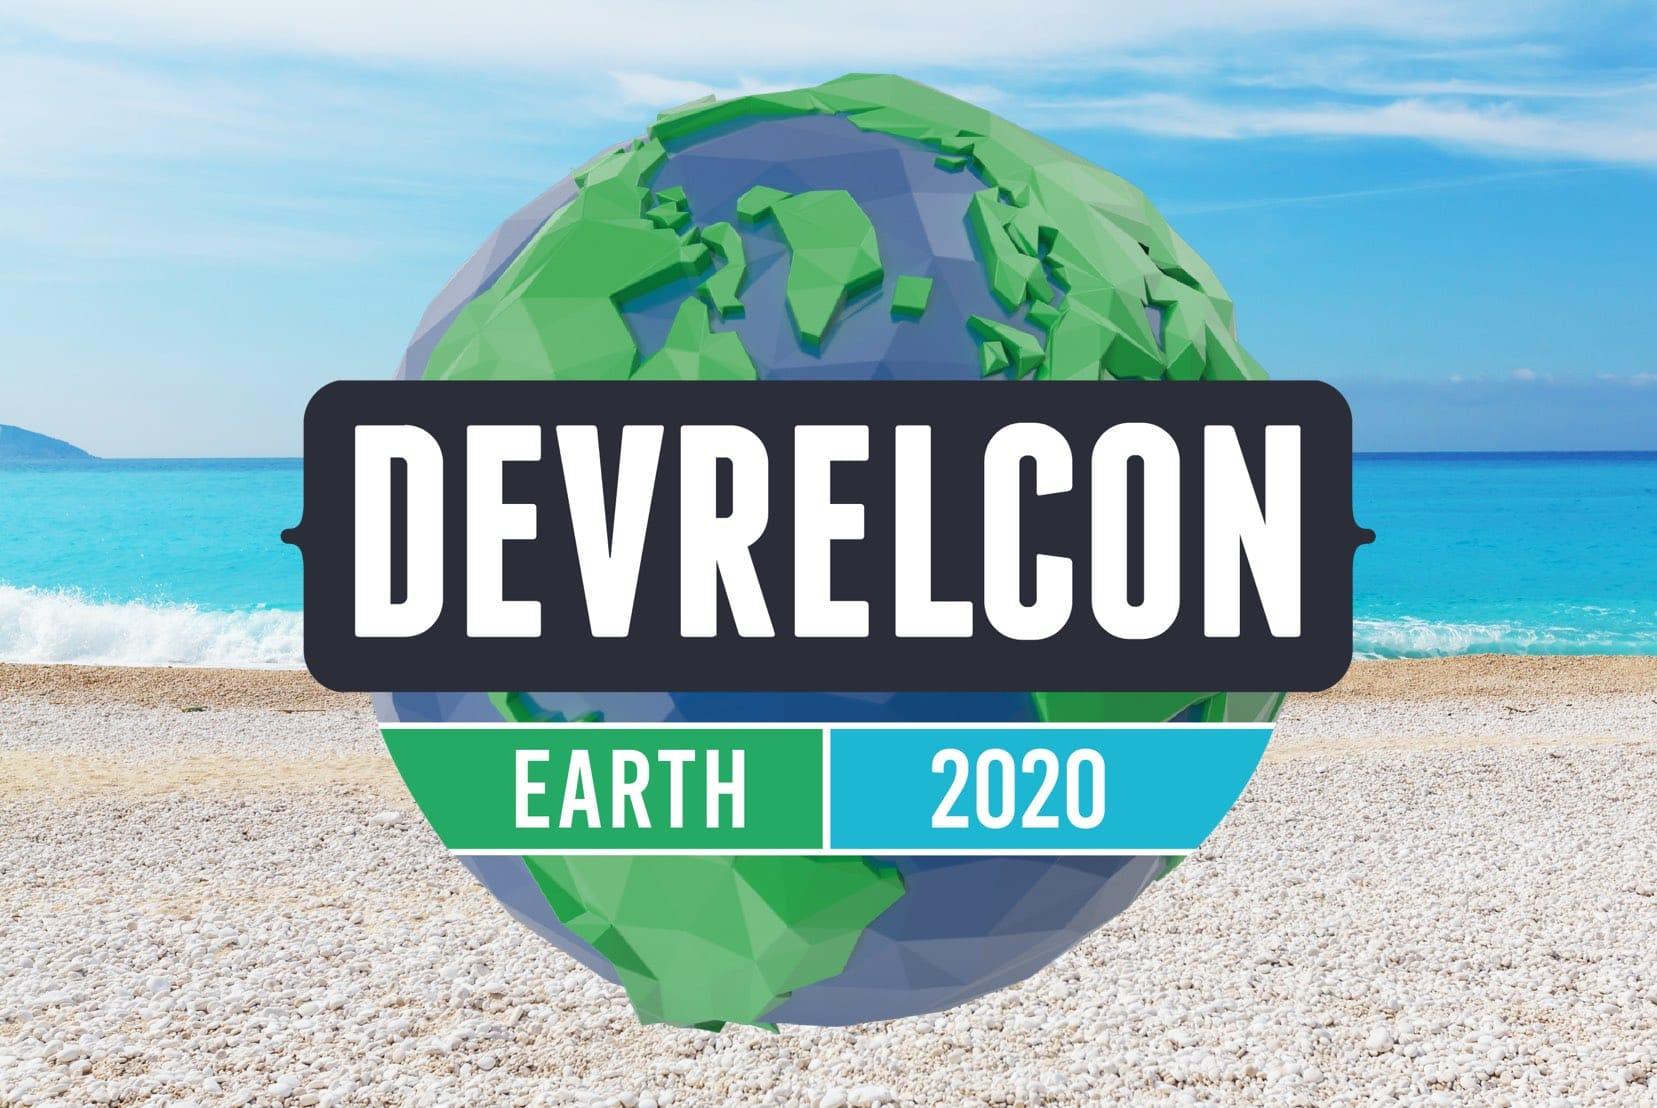 DevRelCon Earth 2020